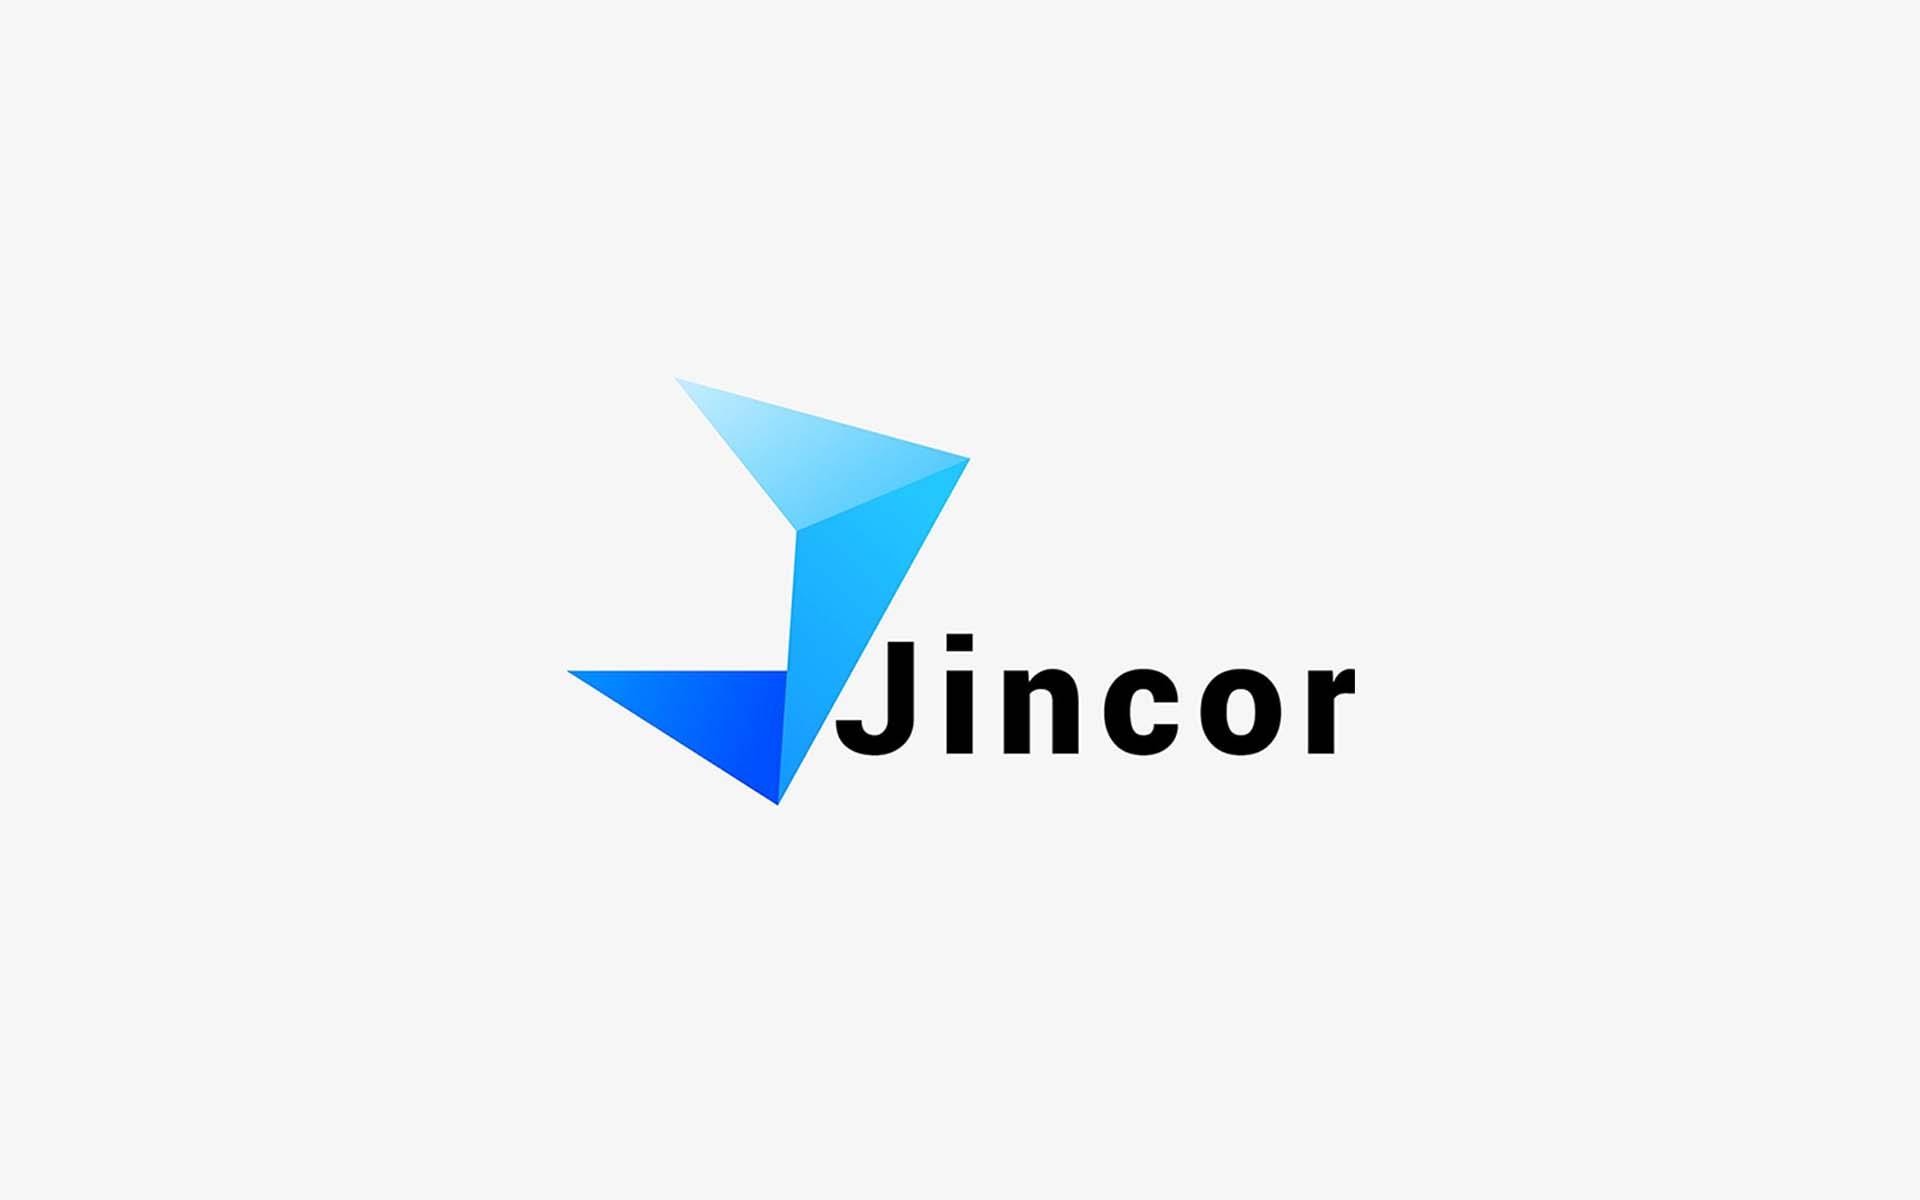 jincor-cover.jpg